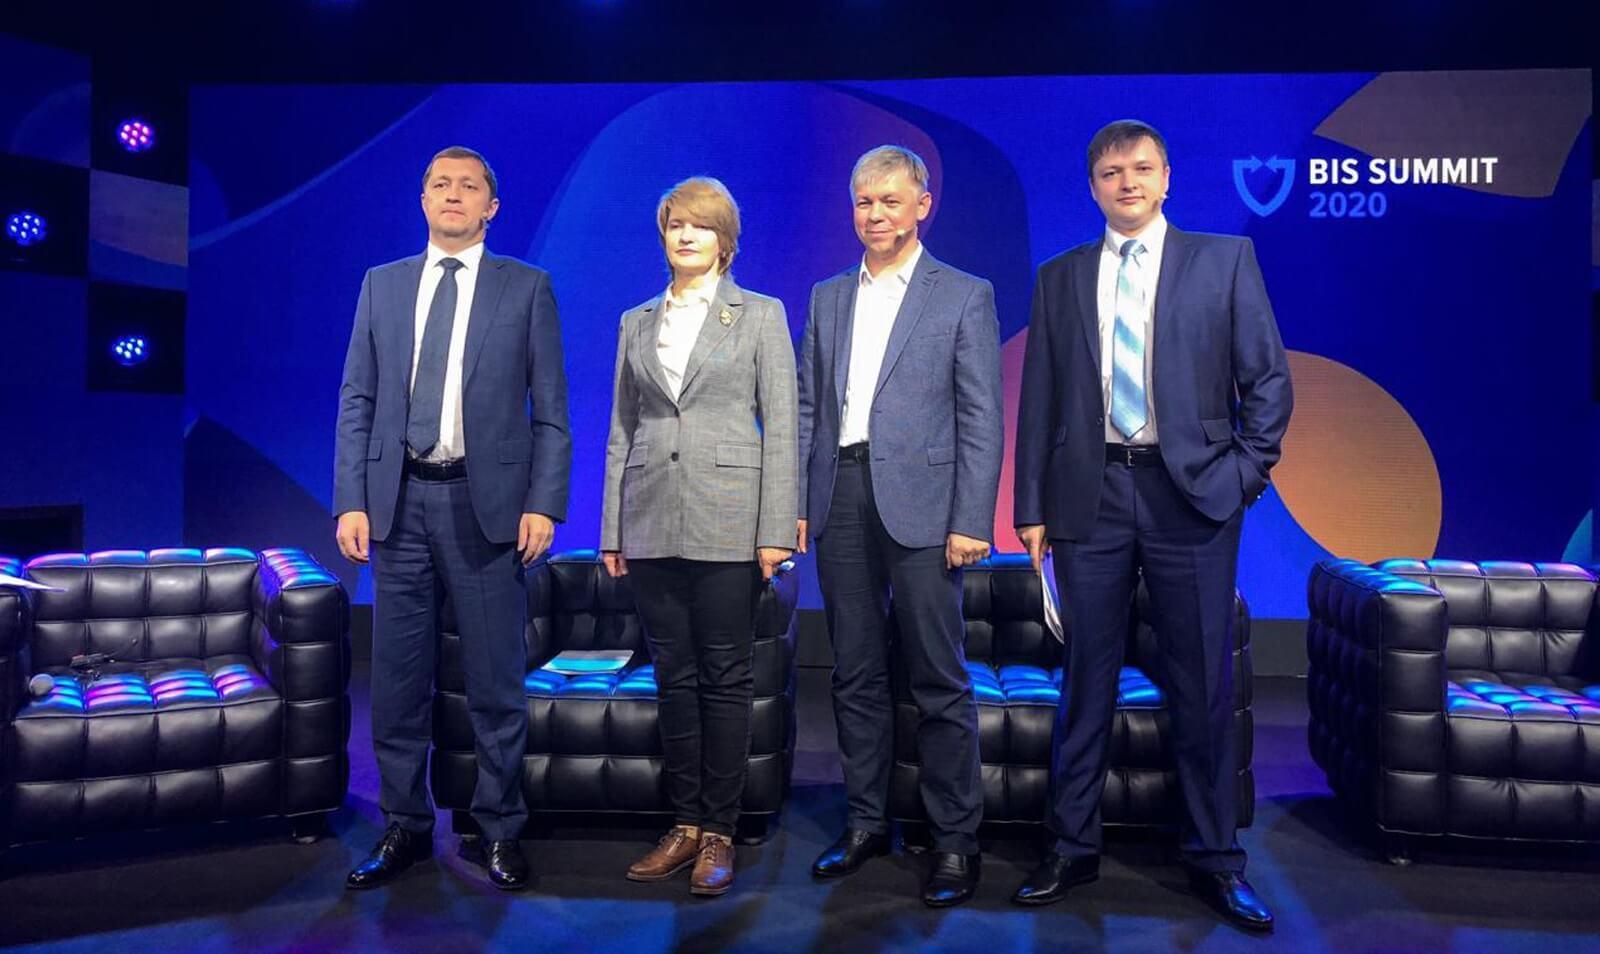 BIS Summit-2020: эксперты обсудили требования регуляторов на 2020-2021